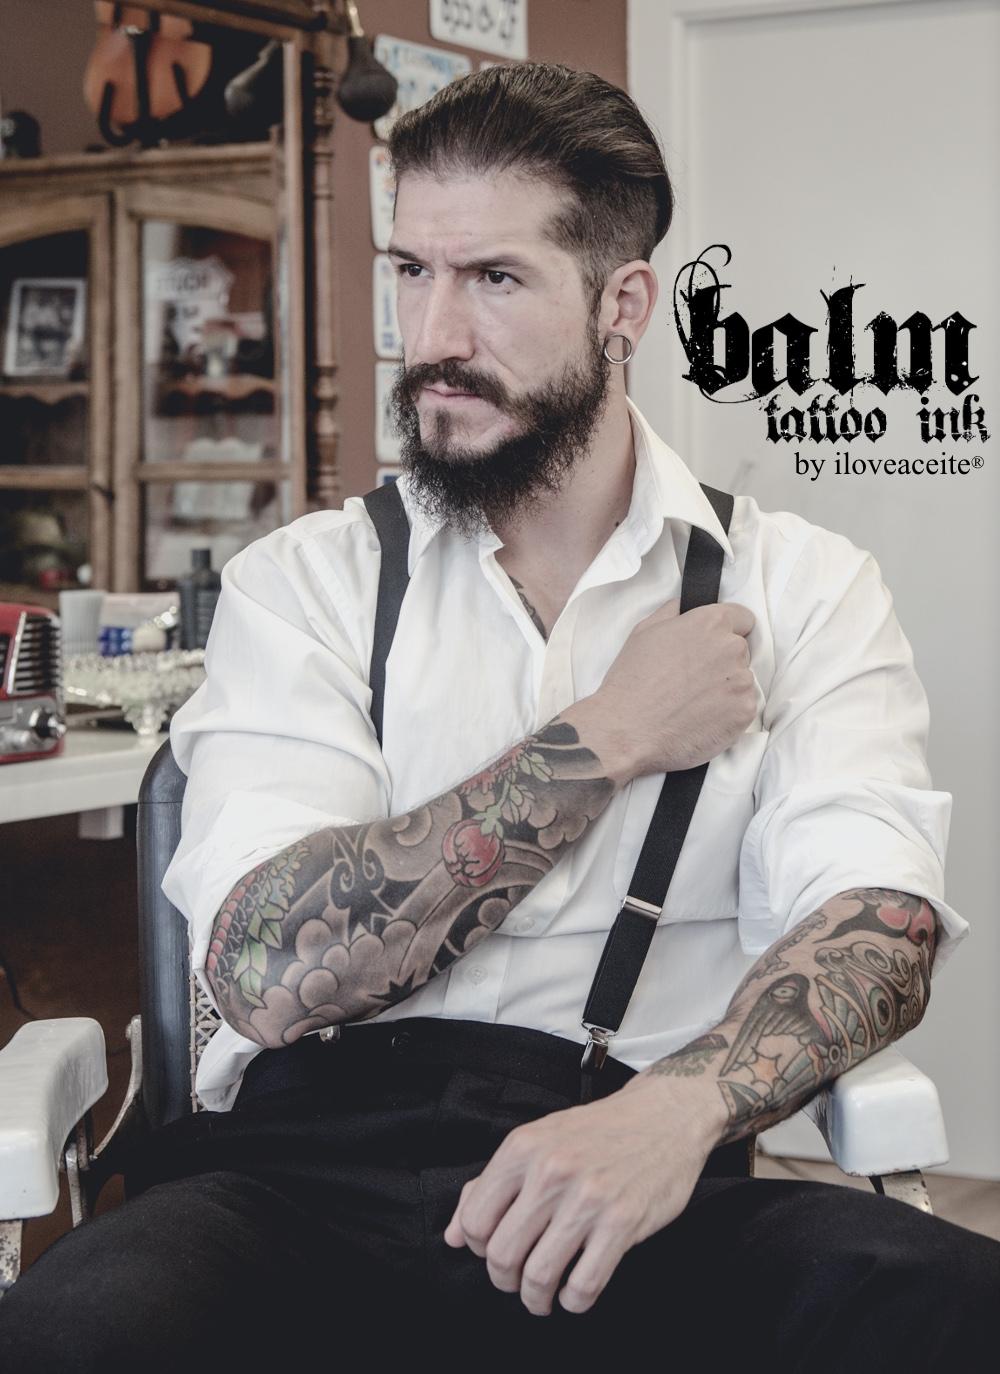 ¿Están pensando en tatuarte o estás recien tatuado/a? iloveaceite nos present su bálsamo para cuidar tatuajes